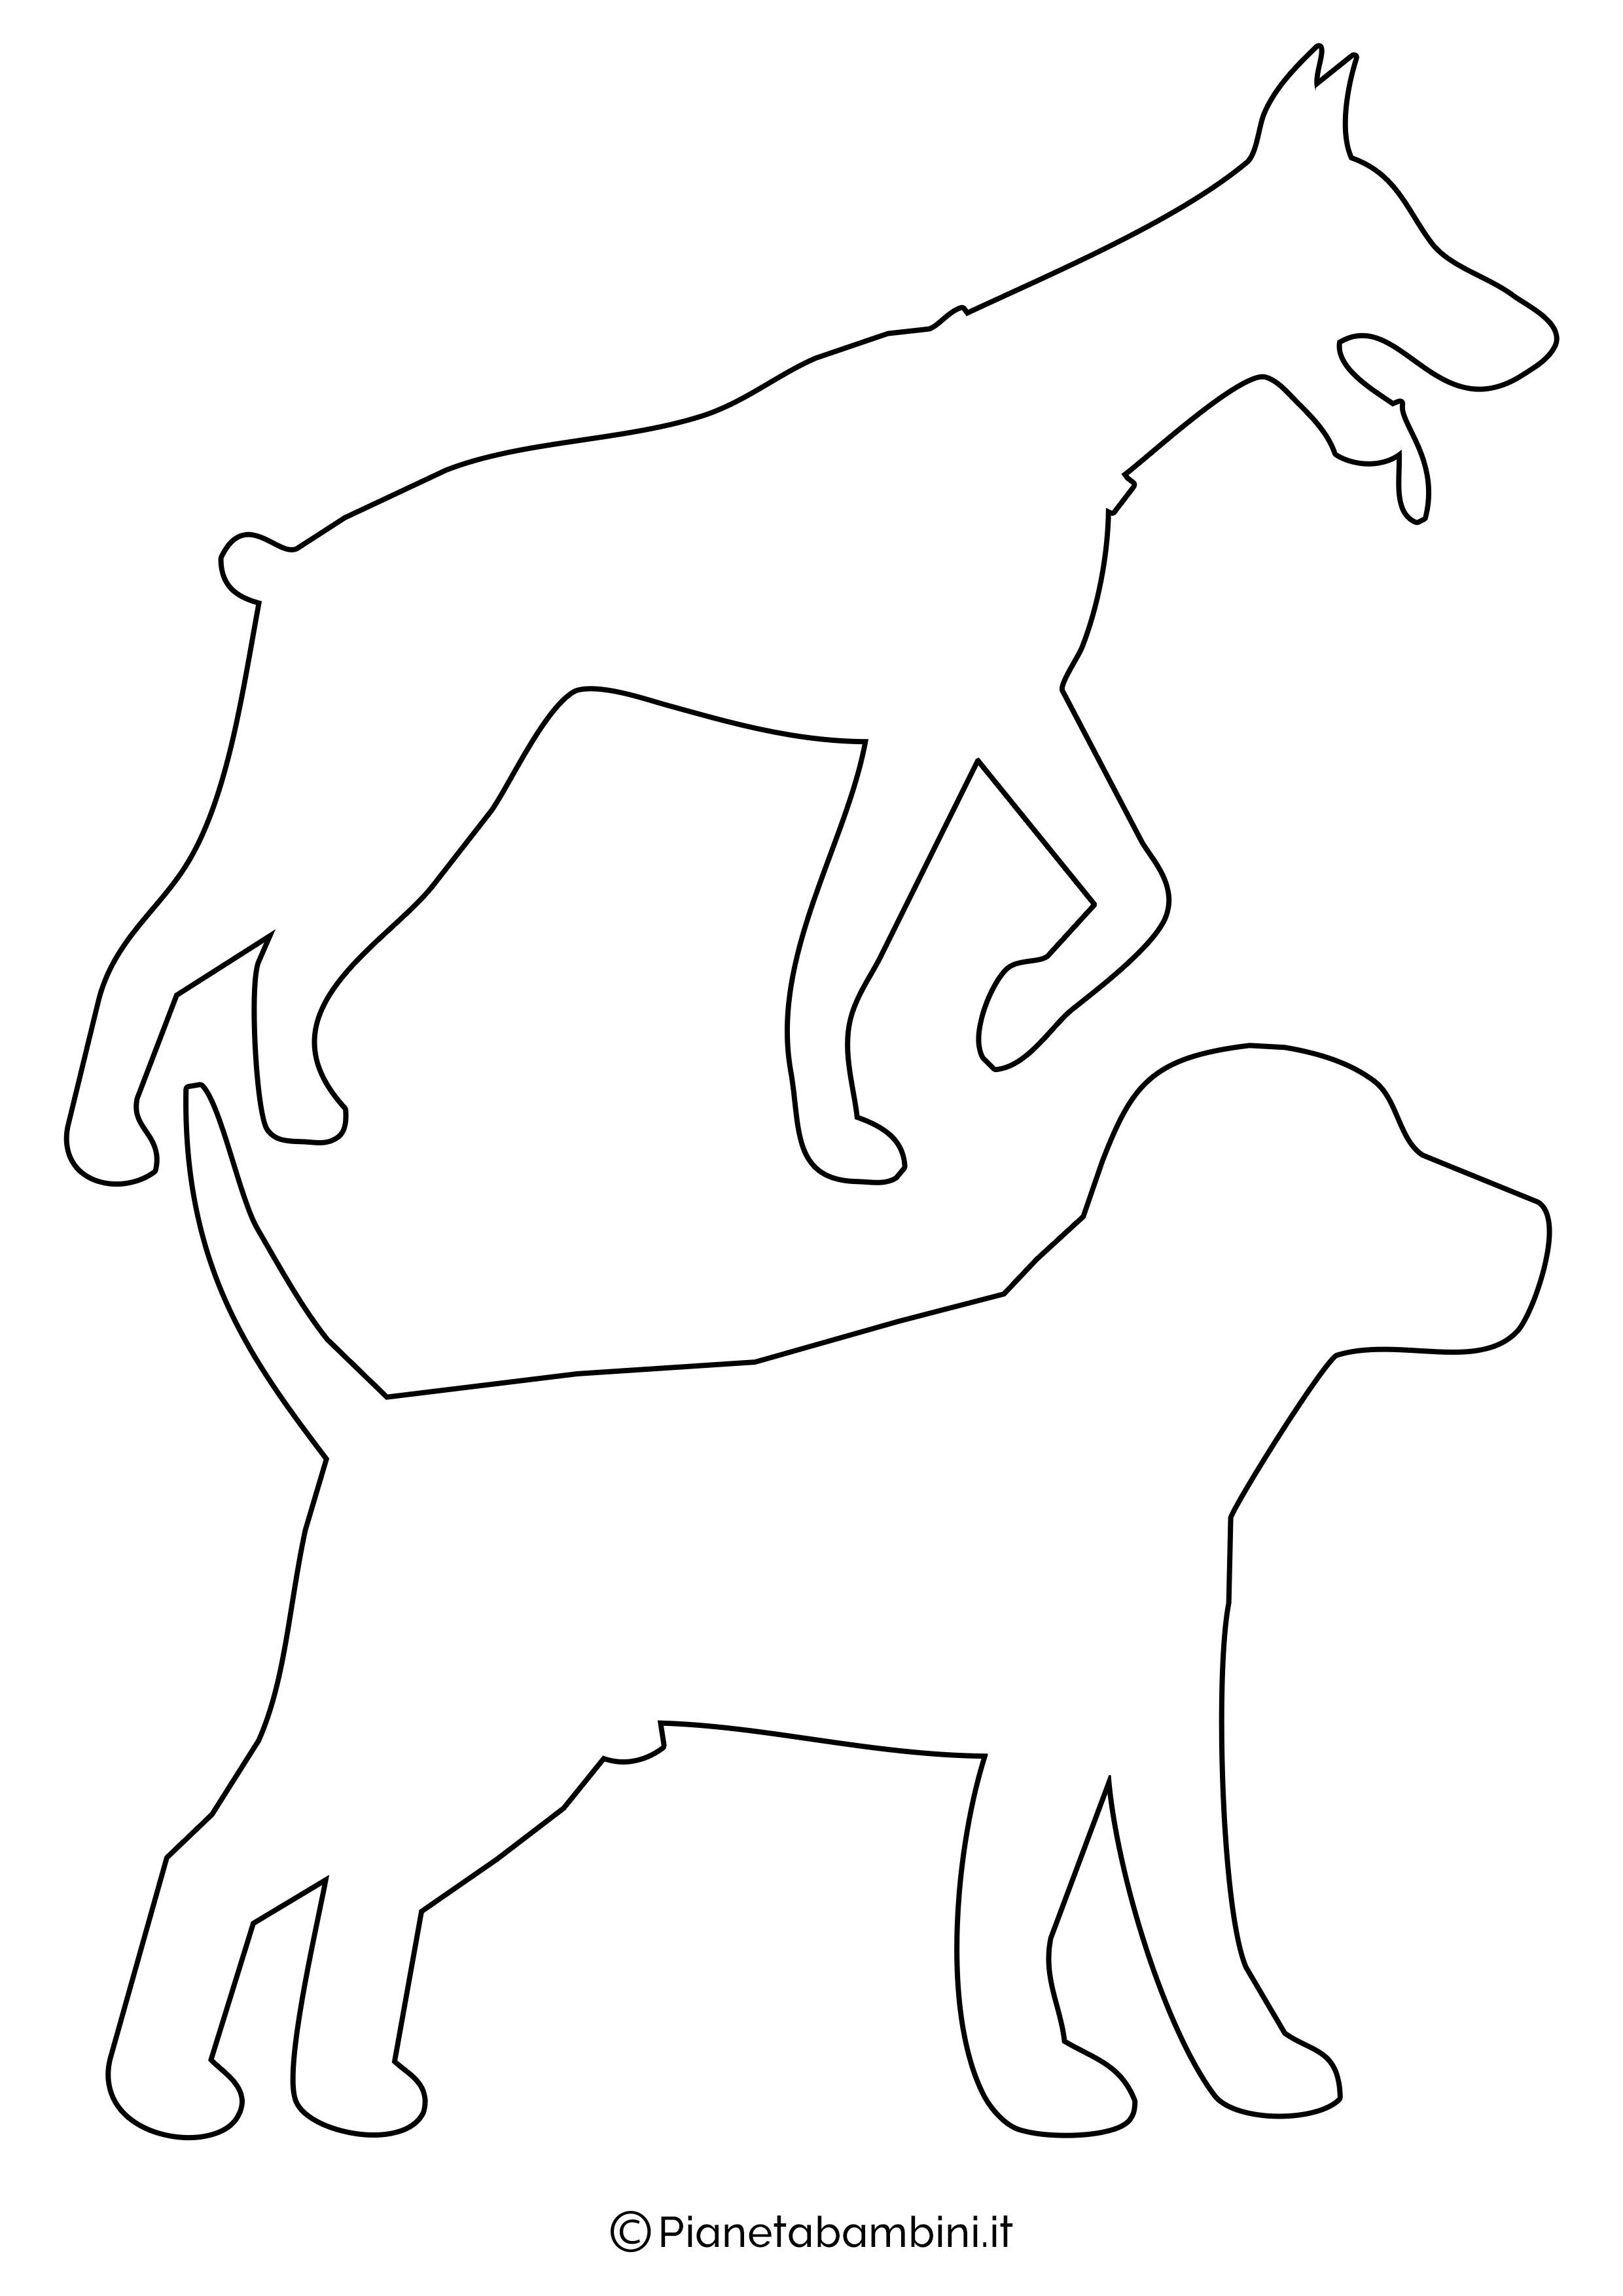 Sagome di cani medie da ritagliare 6